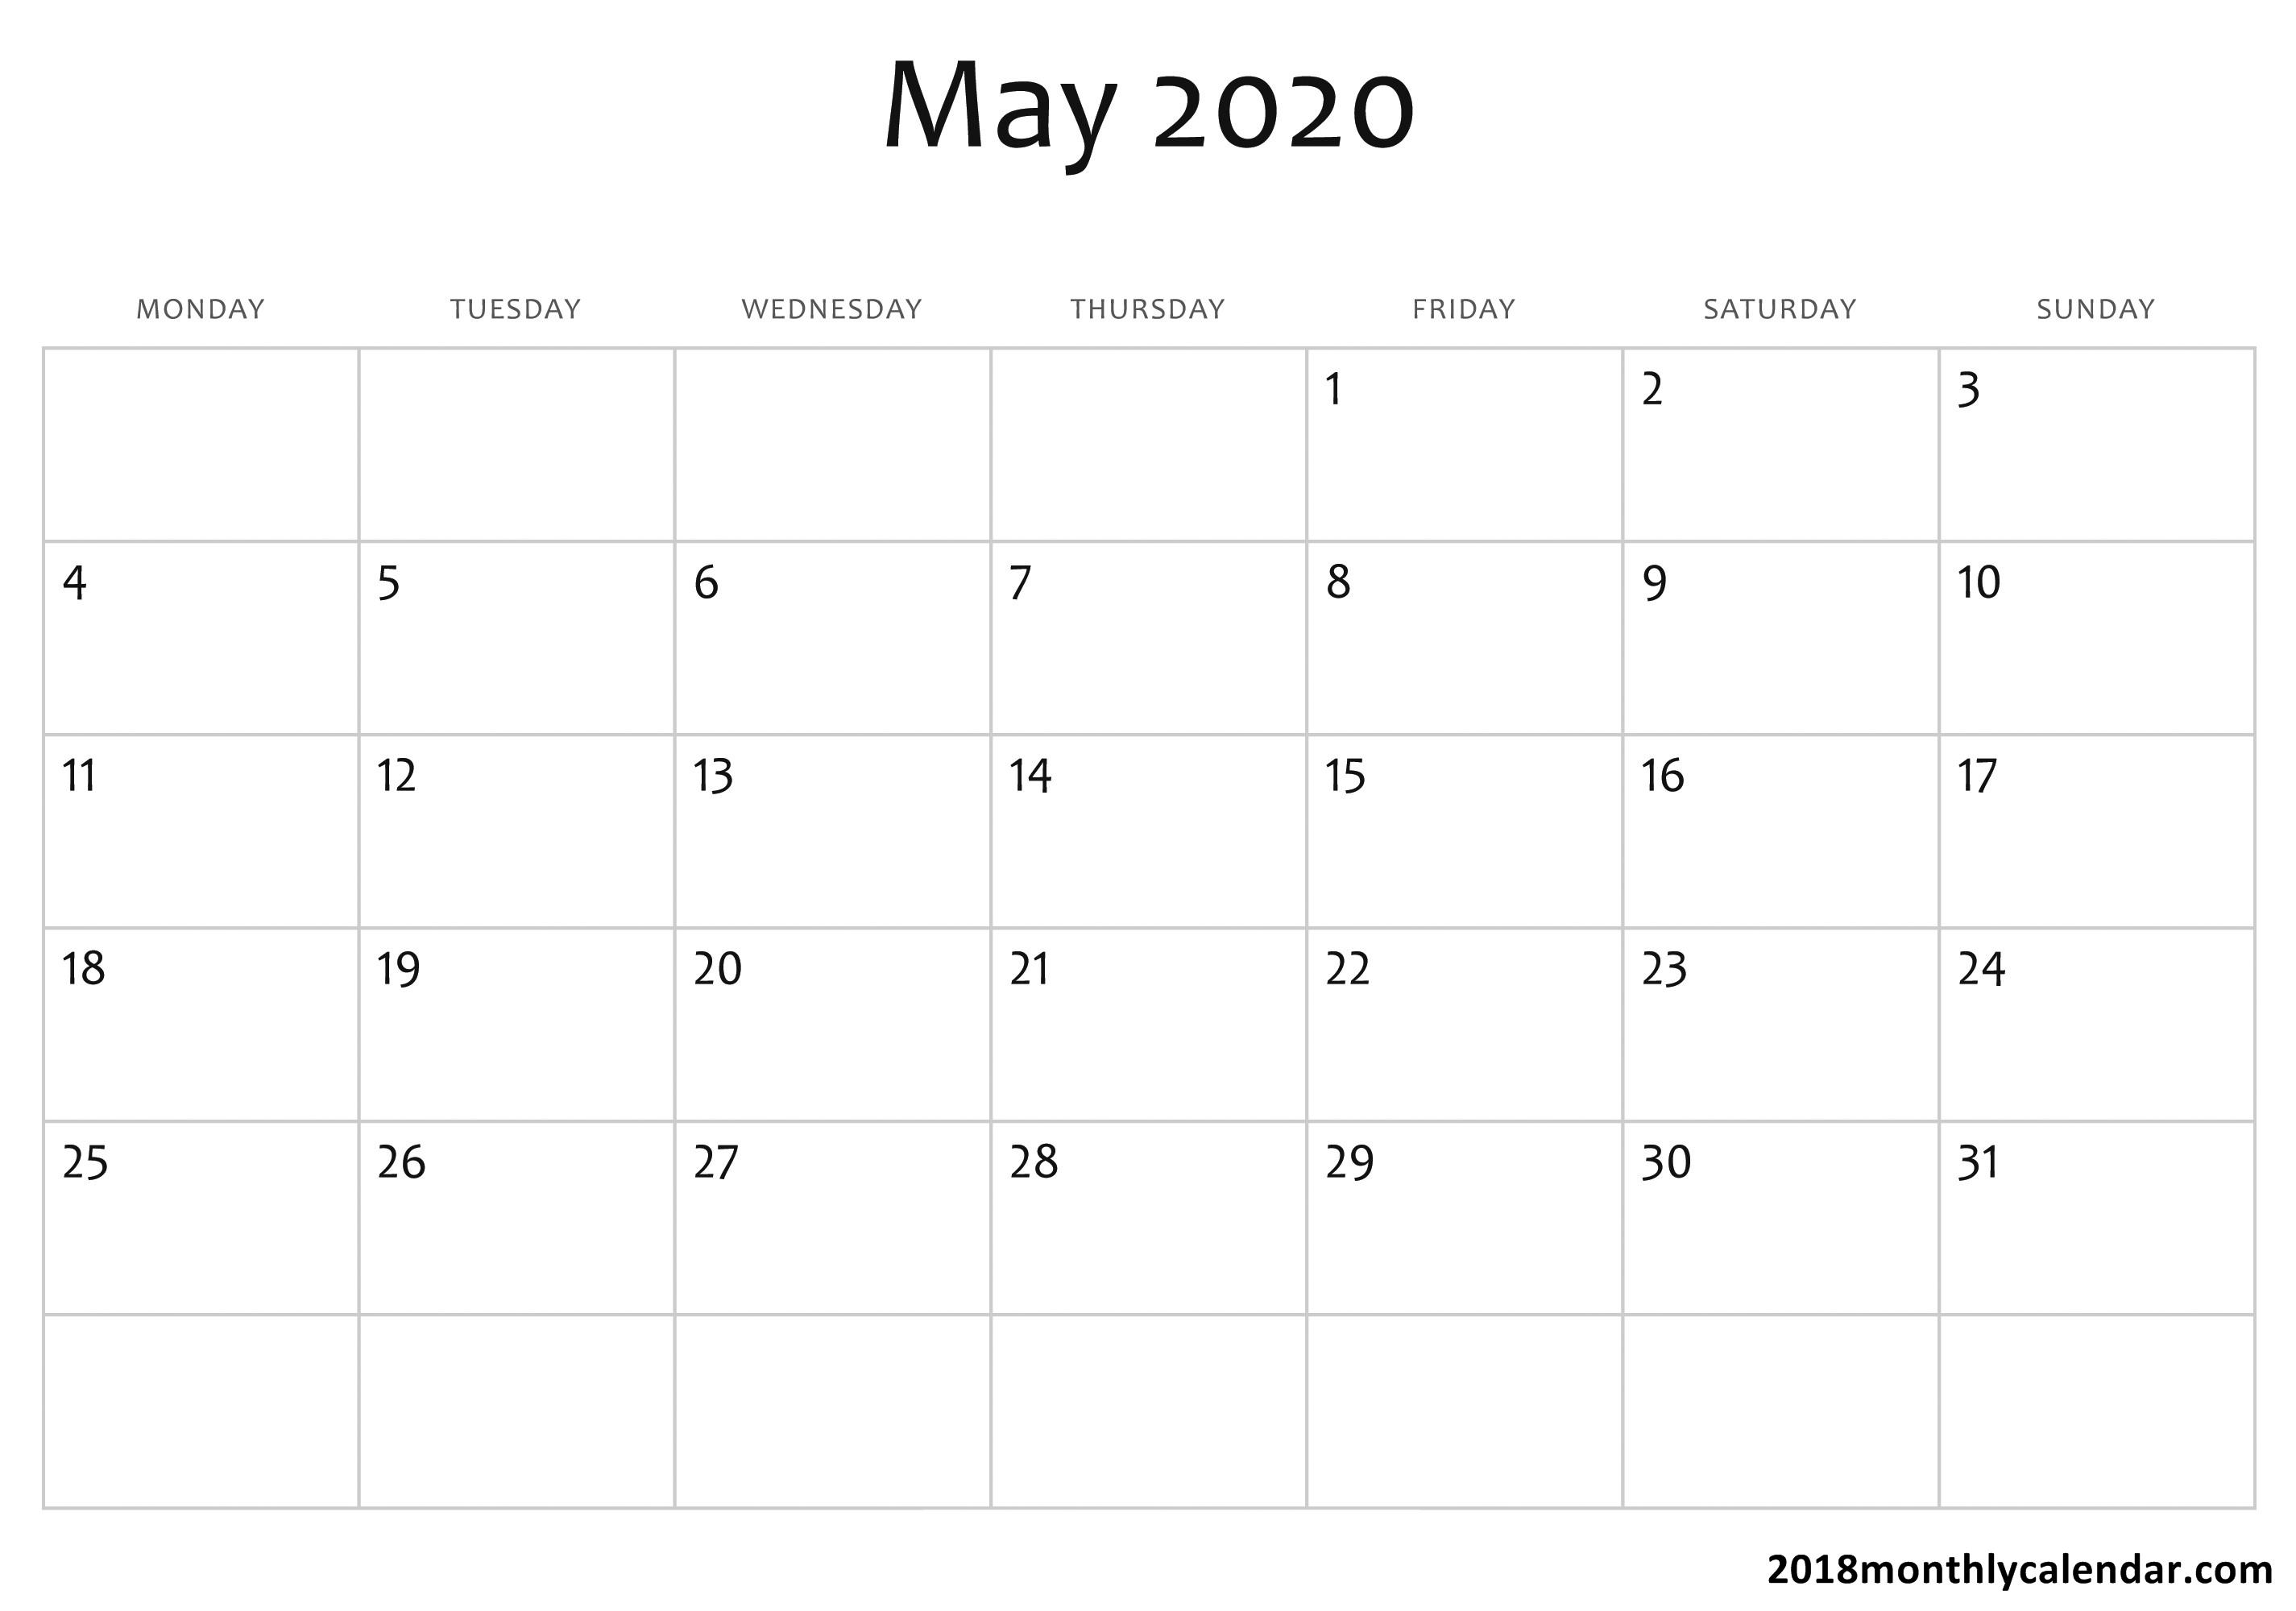 Download May 2020 Calendar – Blank & Editable inside Blank 2020 Calendars To Edit